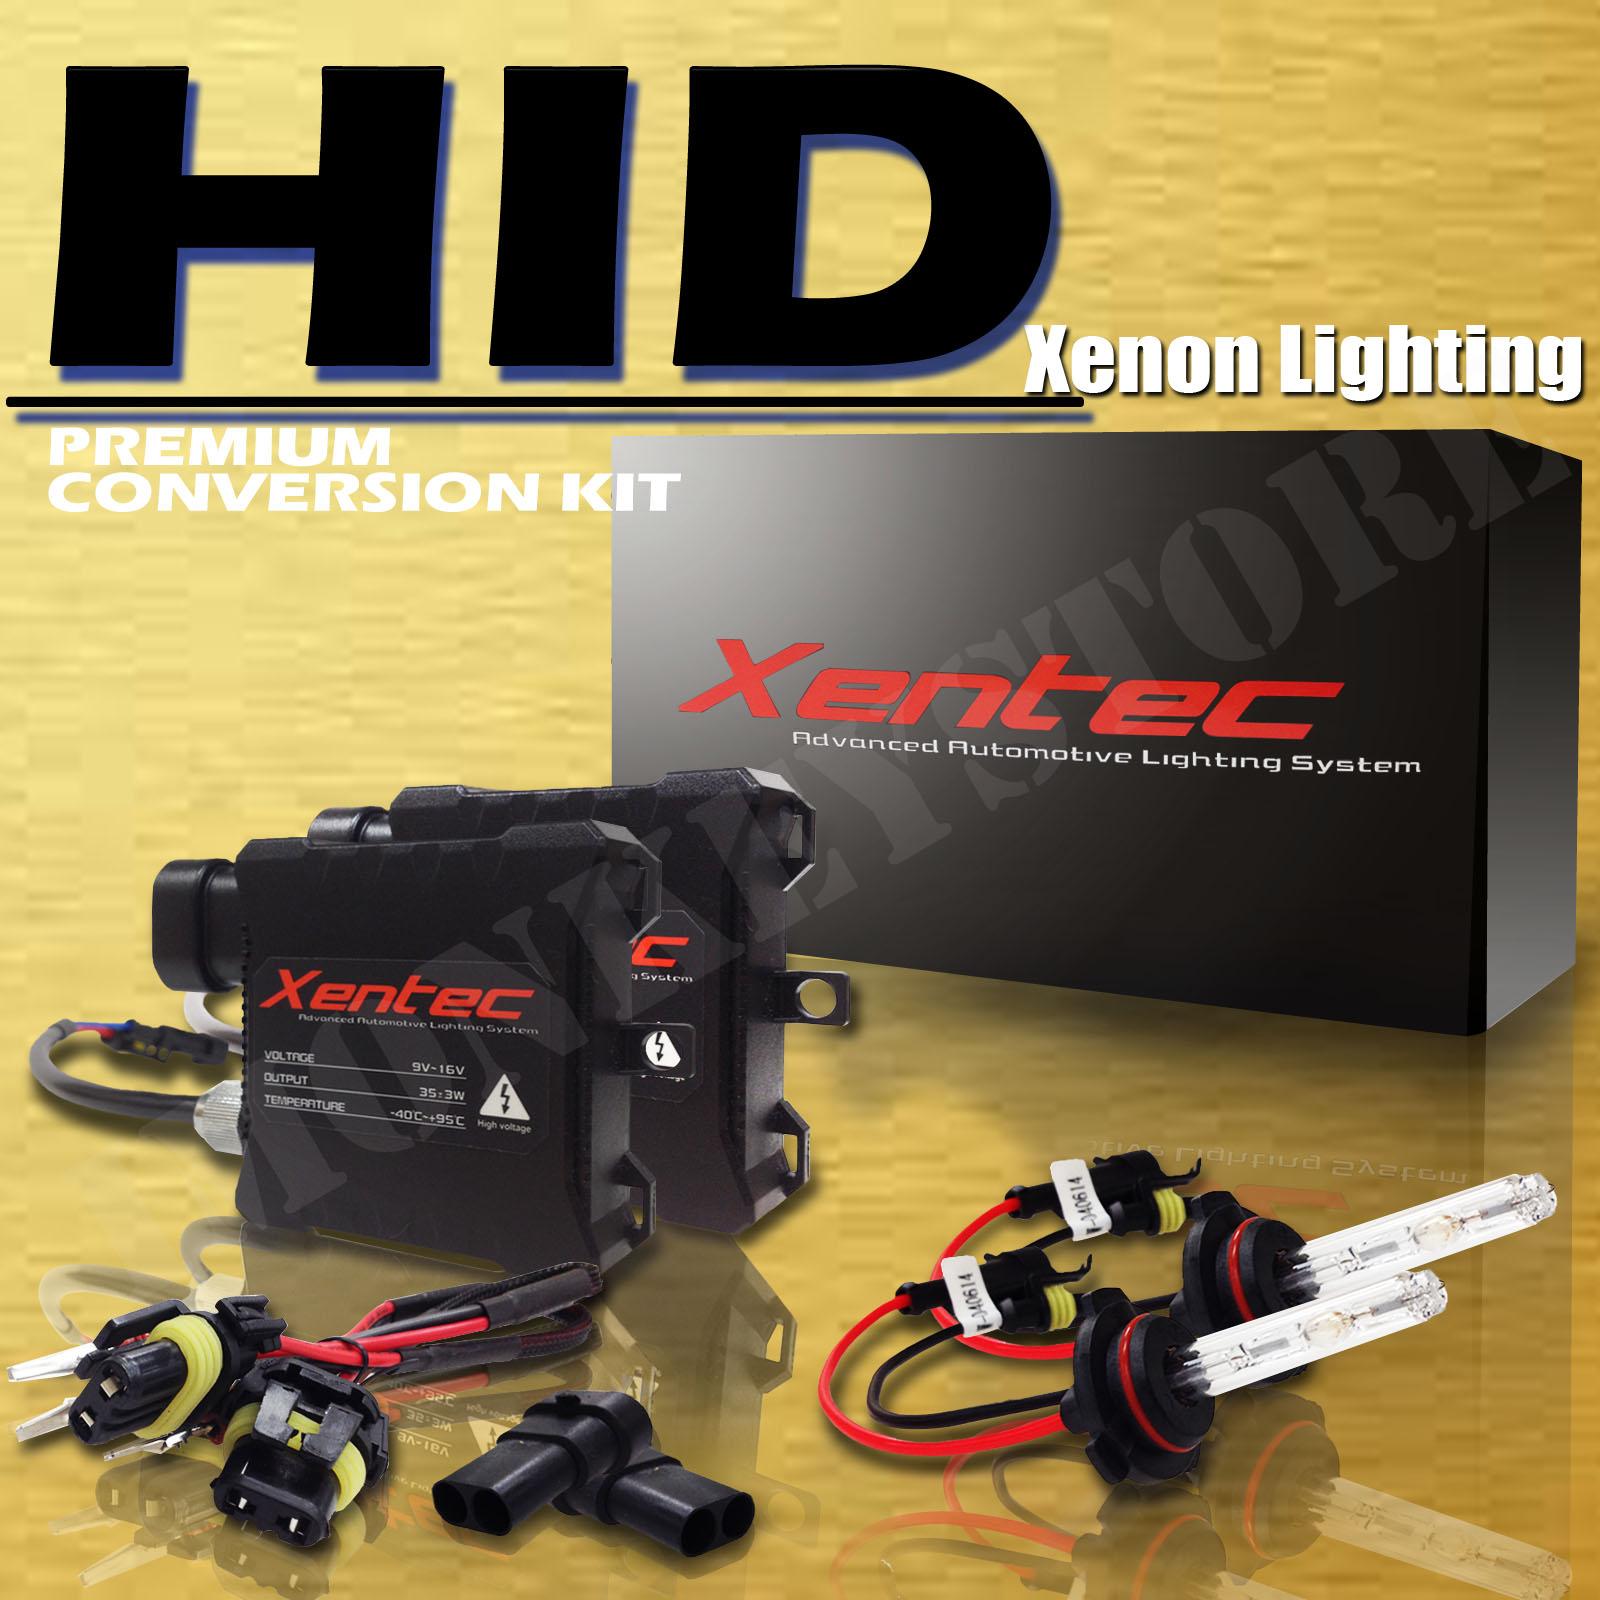 Xentec Xenon Lights HID Conversion Kit for Maxima H4 H11 9004 9005 9006 9007 D2S